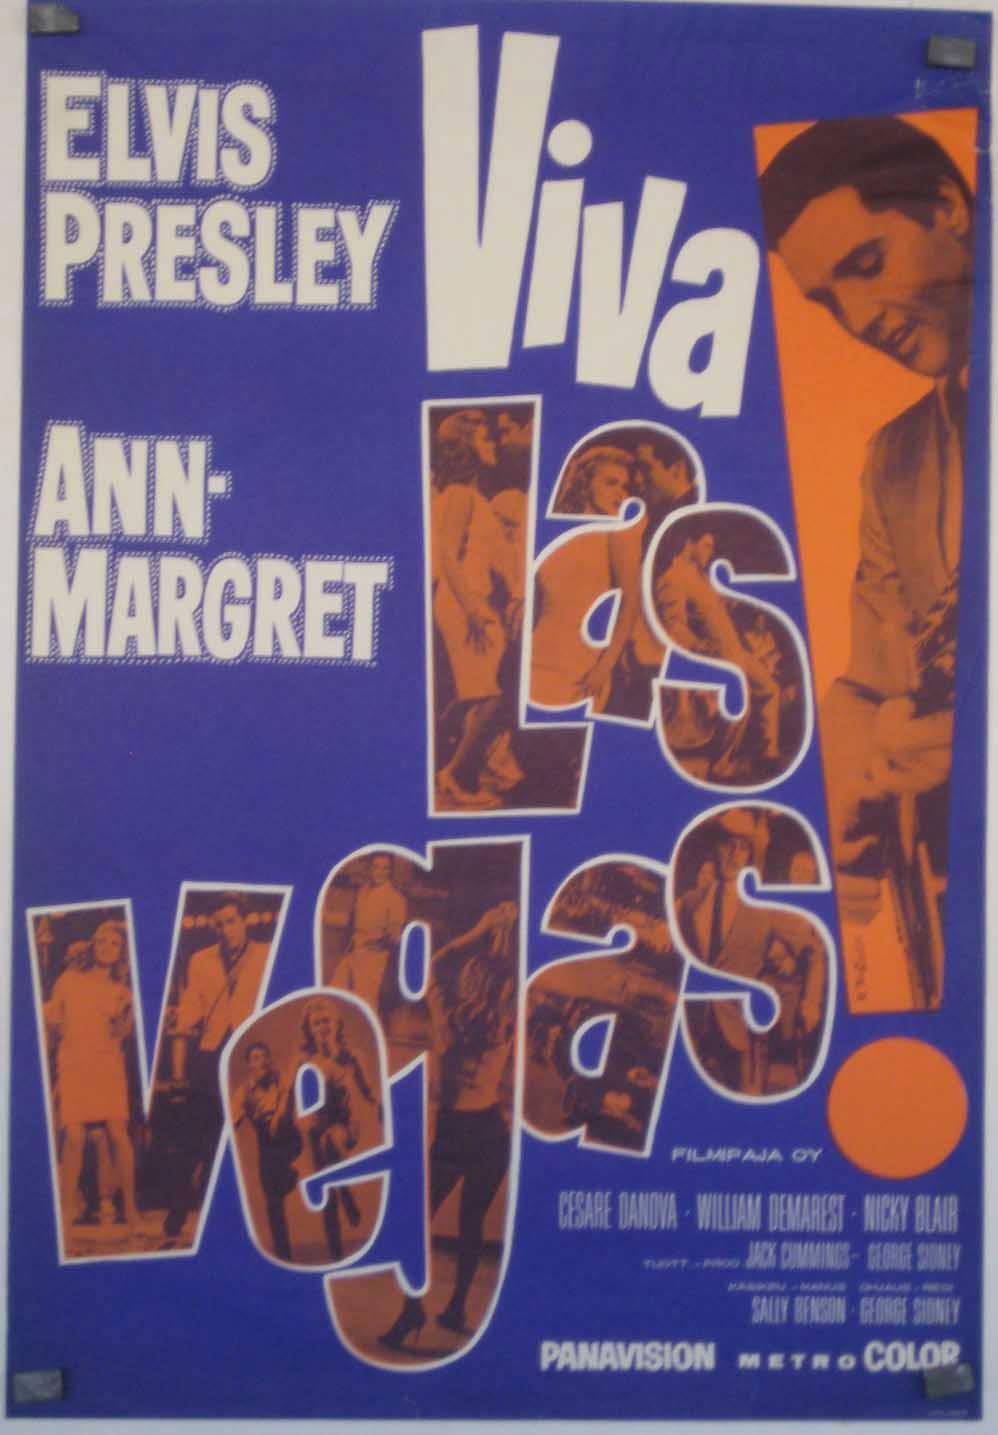 Viva Las Vegas MOVIE POSTER/VIVA LAS VEGAS/POSTER